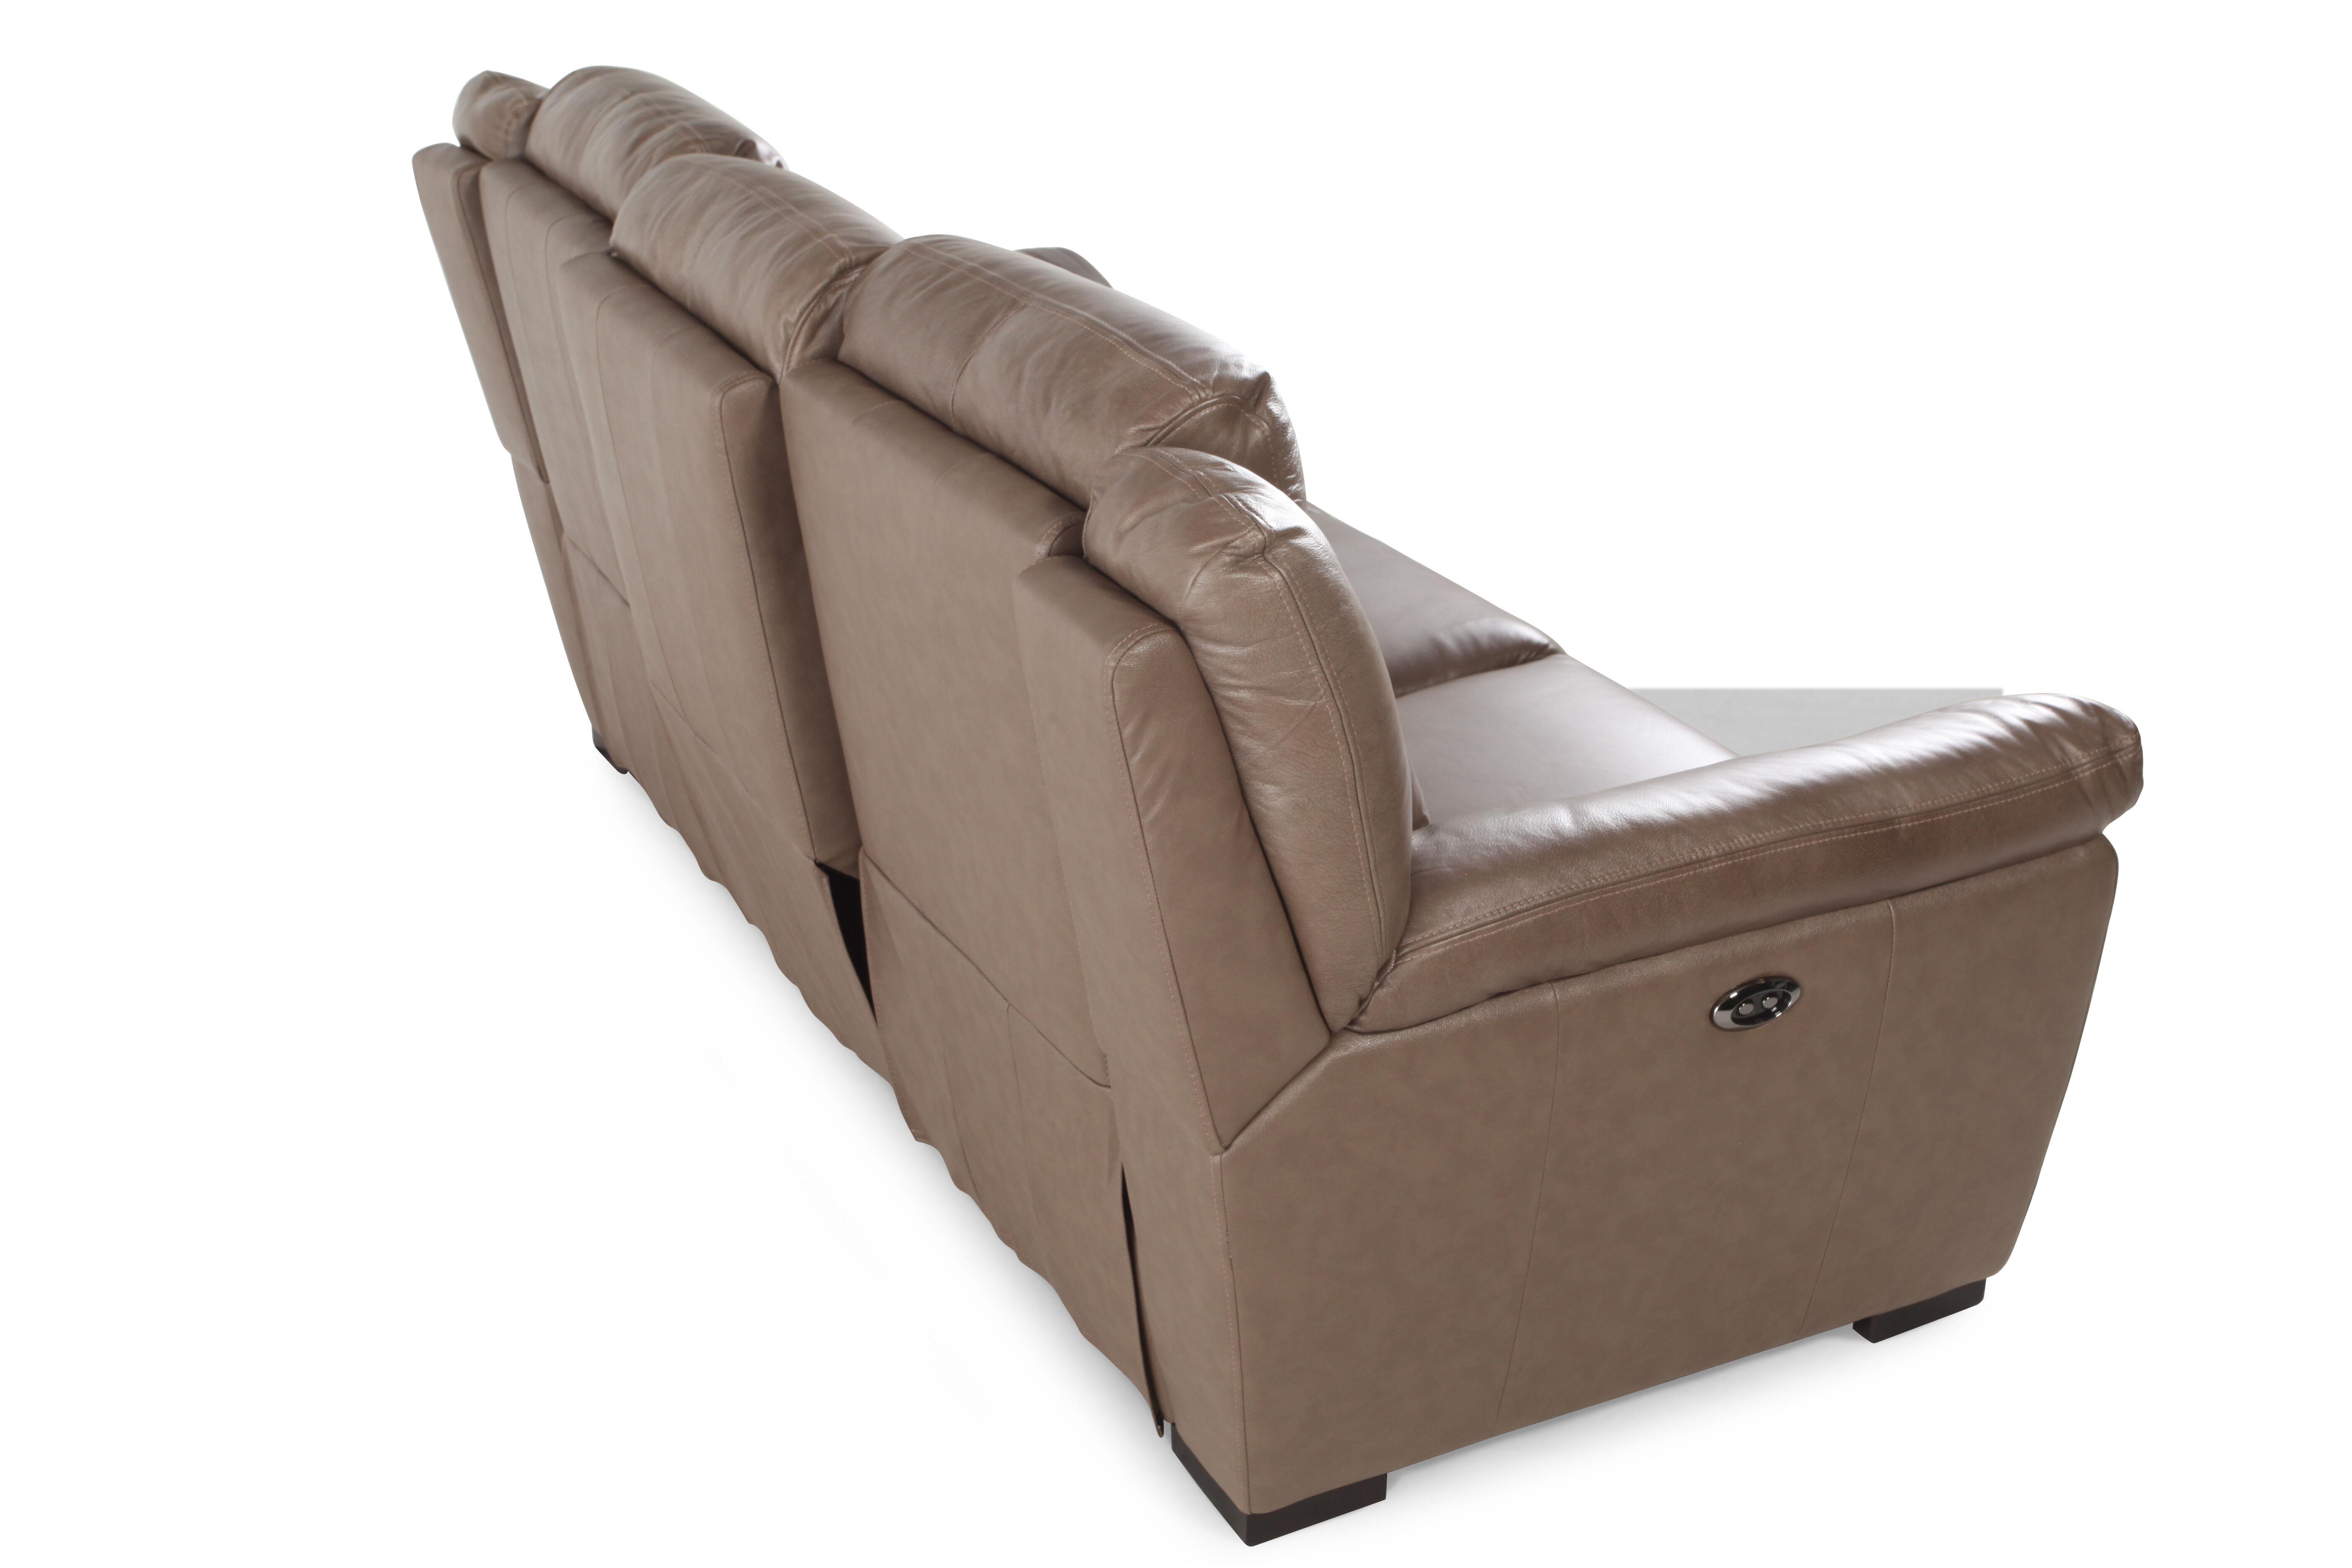 Elegant ... Contemporary 88u0026quot; Power Reclining Sofa In Nutmeg Brown. U2039 U203a